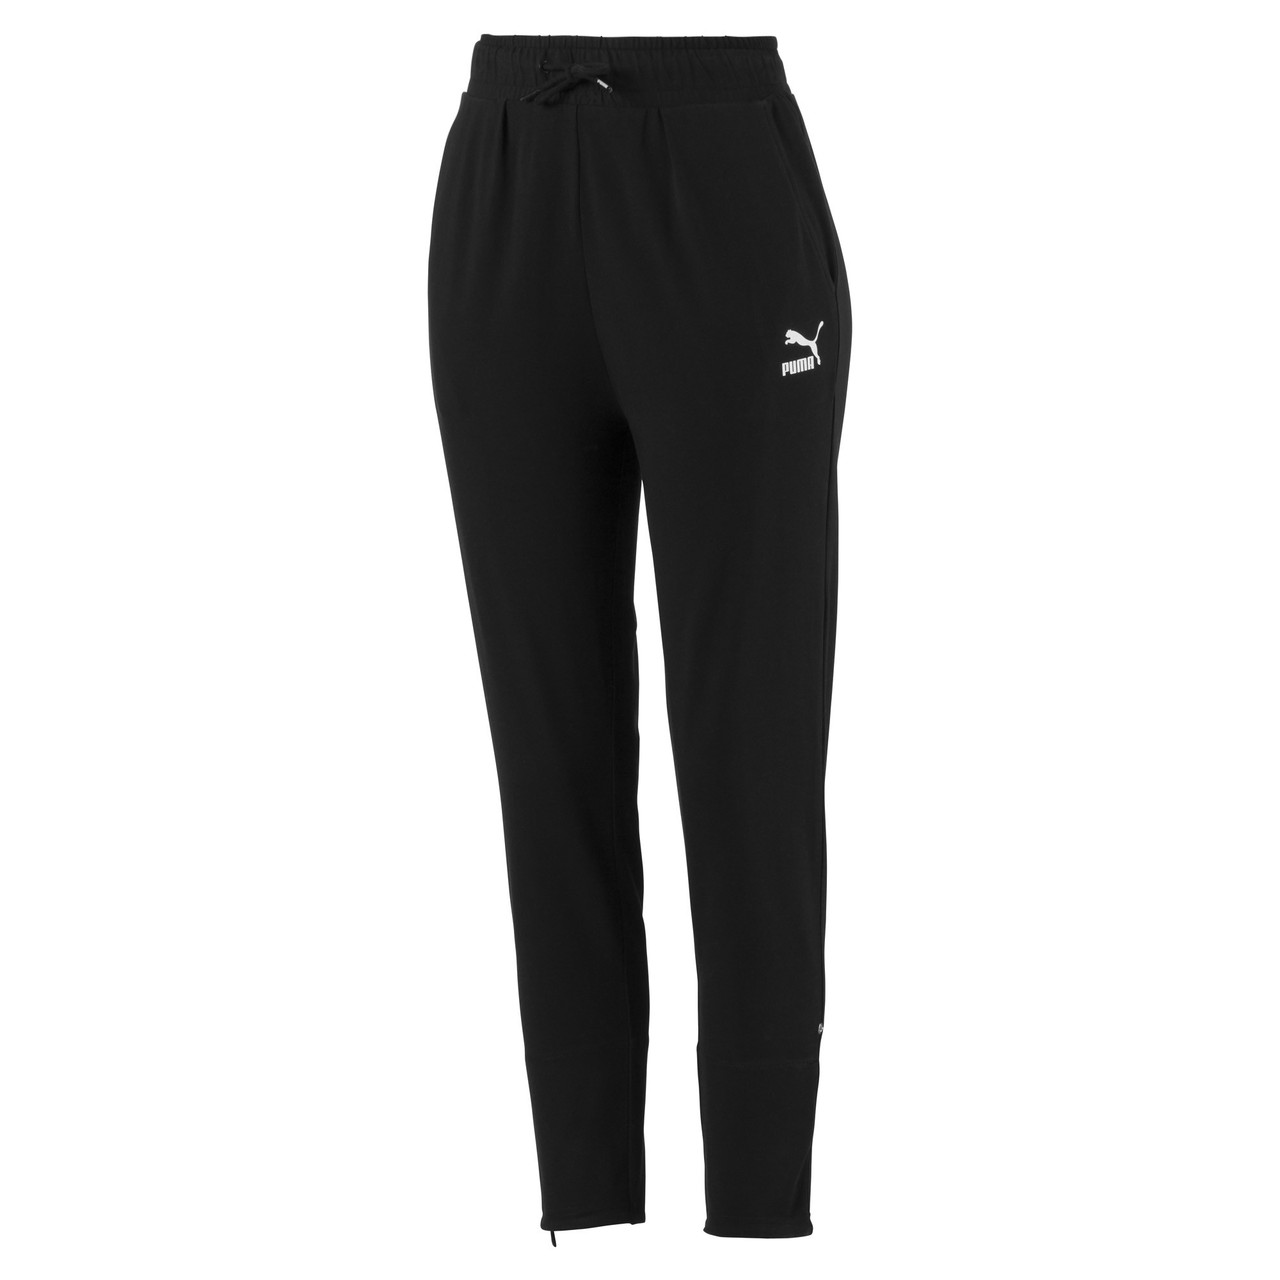 Спортивные штаны Classics All-Over Printed Roll-Up Women's Pants